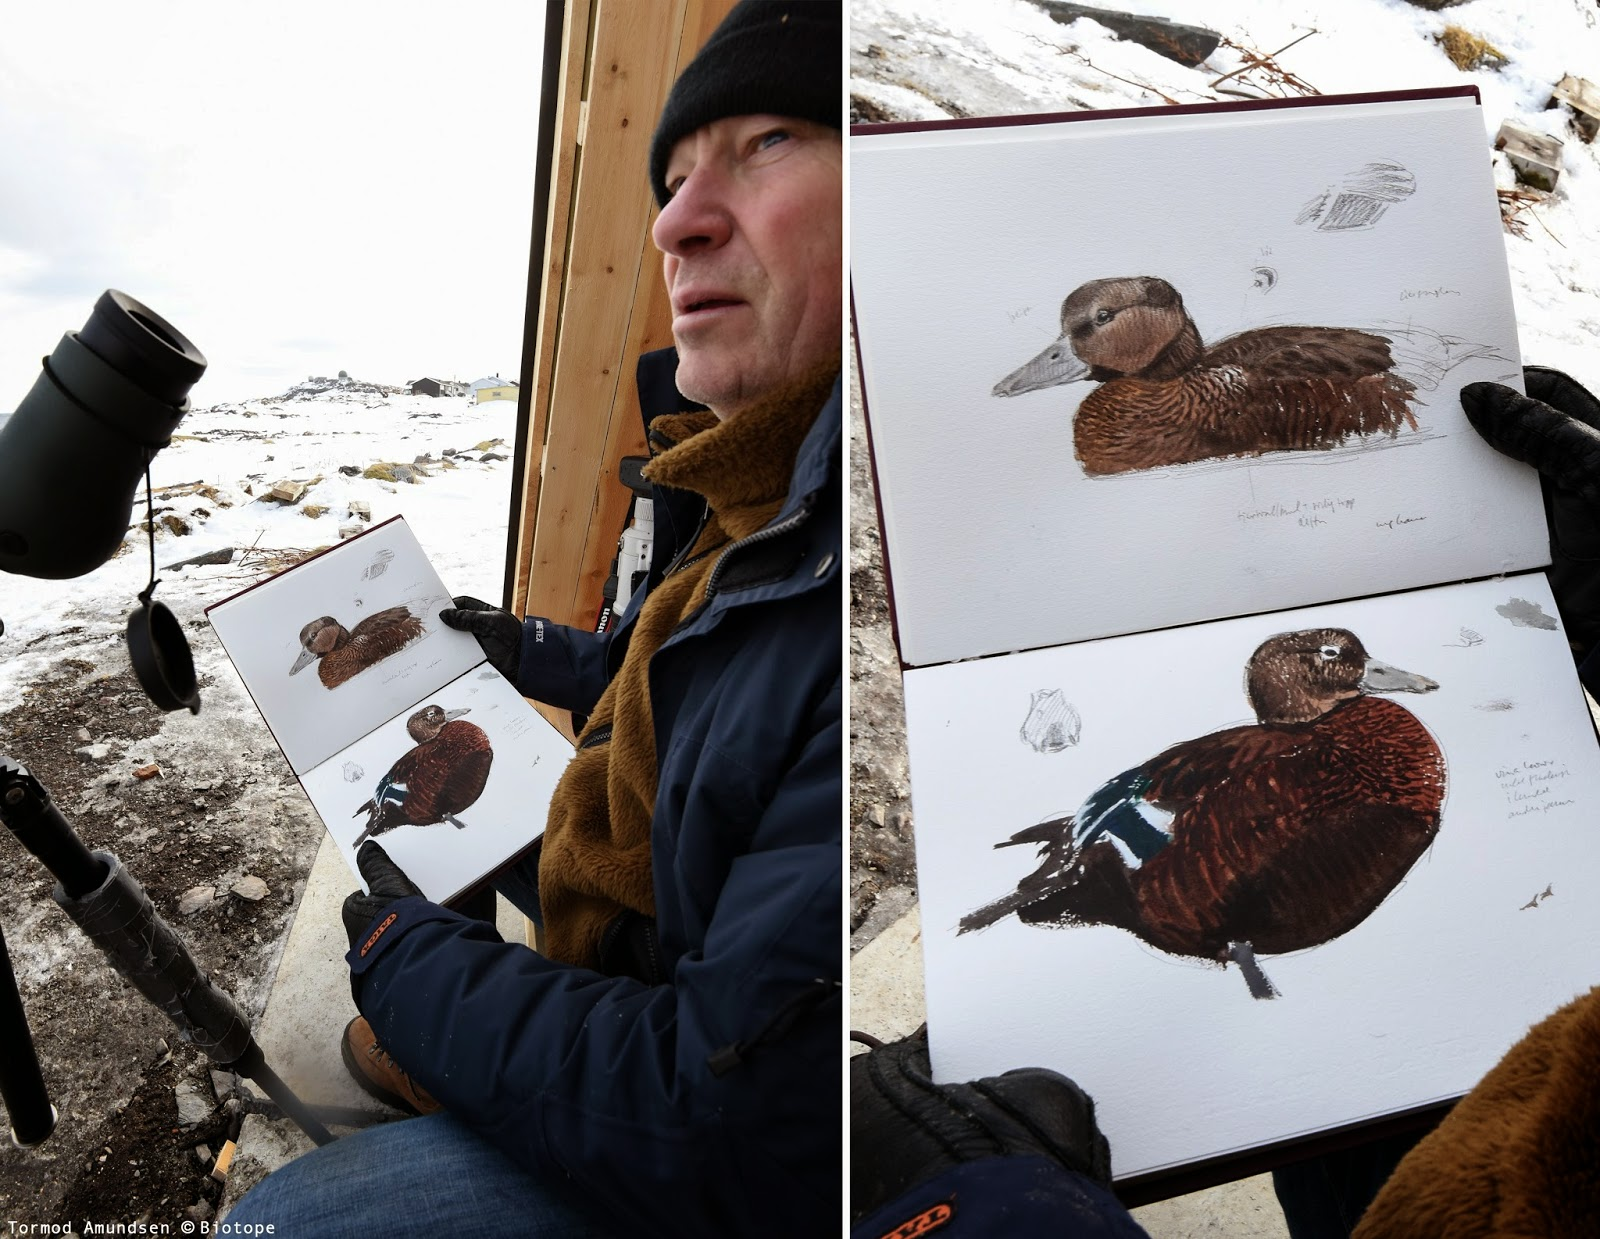 Gullfest 2015 Lars Jonsson at Hasselnes birdhide sketching ps-edit Amundsen © Biotope.jpg